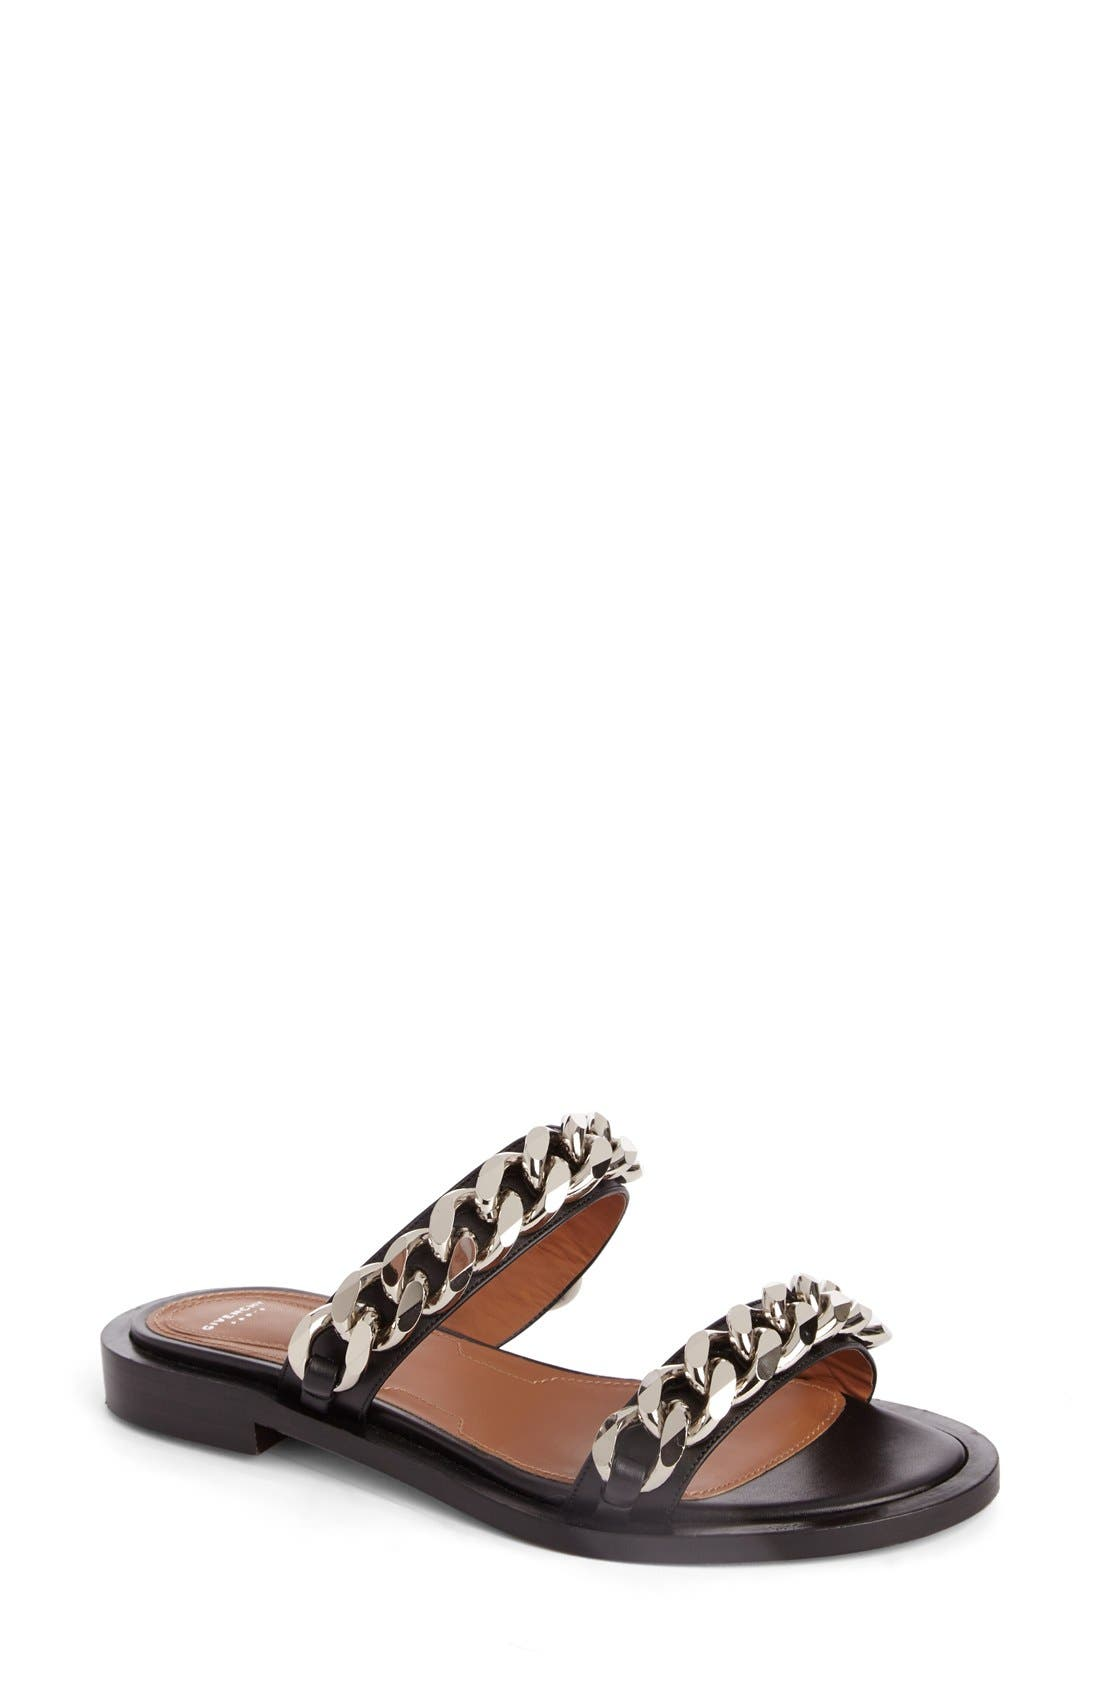 Givenchy Double Chain Slide Sandal (Women)